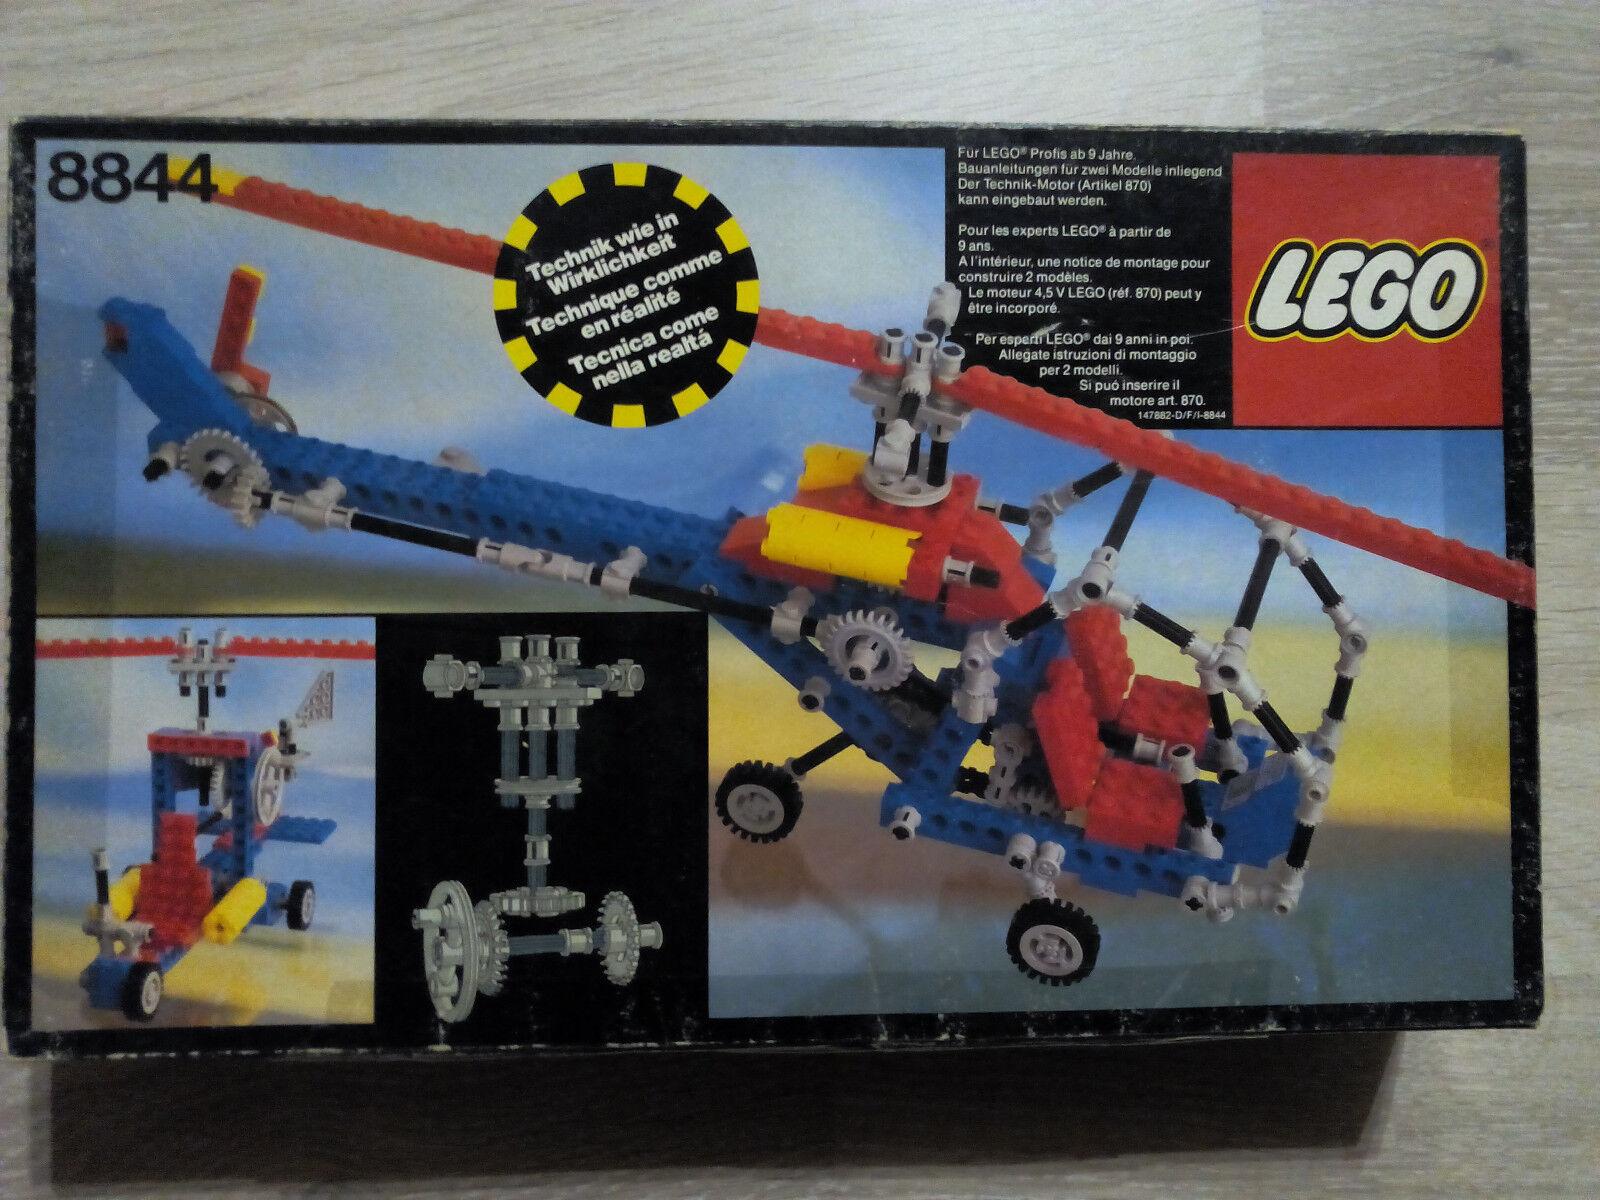 Lego Technic Technik 8844 Helicopter   GUTER ZUSTAND - RARITÄT